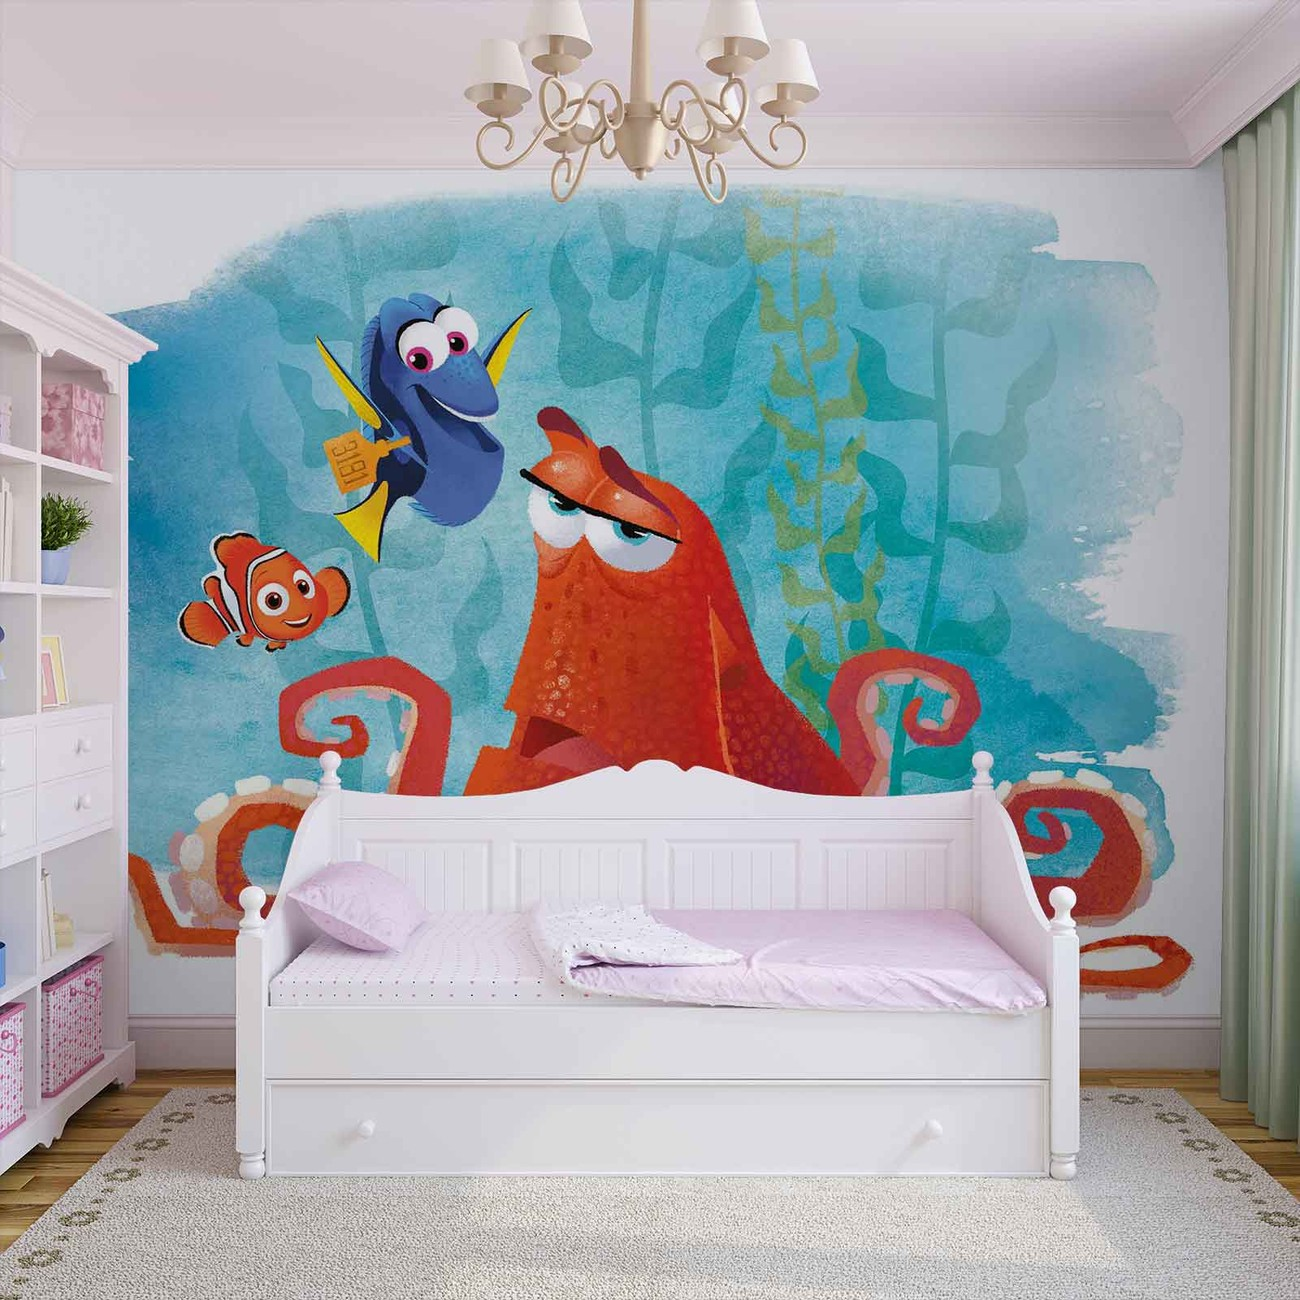 Disney nemo dory poster mural papier peint acheter le - Poster mural sur mesure ...